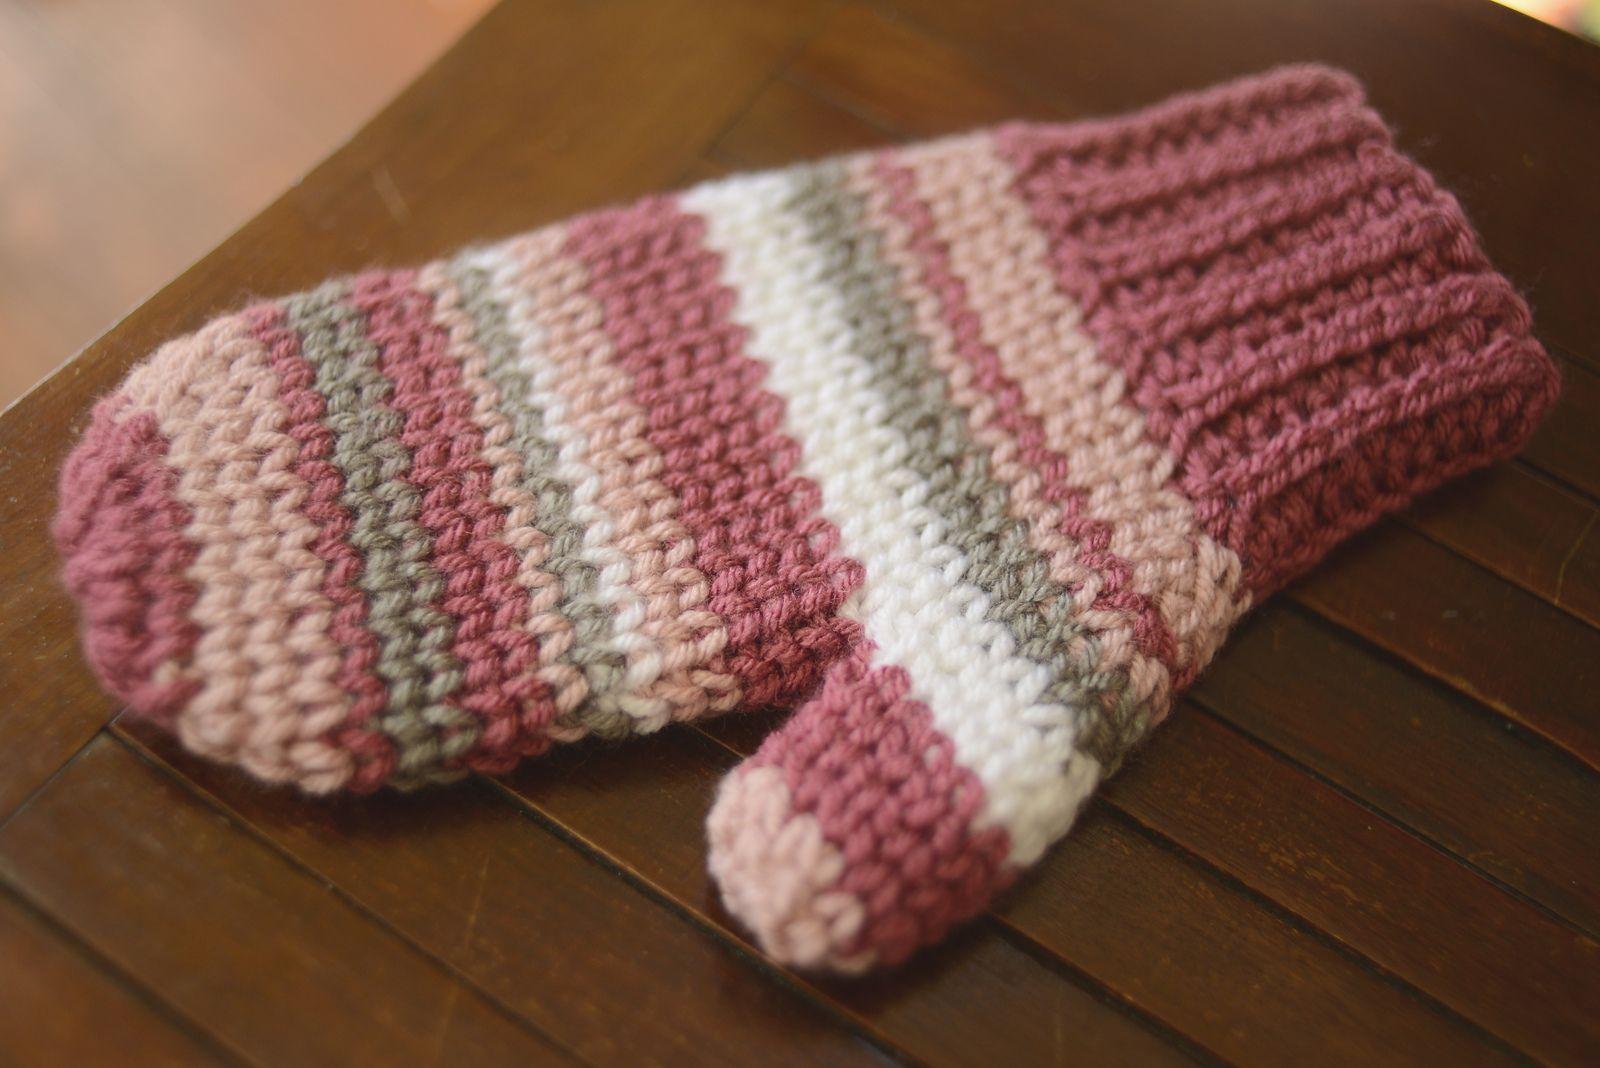 Ravelry: Photography Mitten by Carmen Jacob | Knitting | Pinterest ...